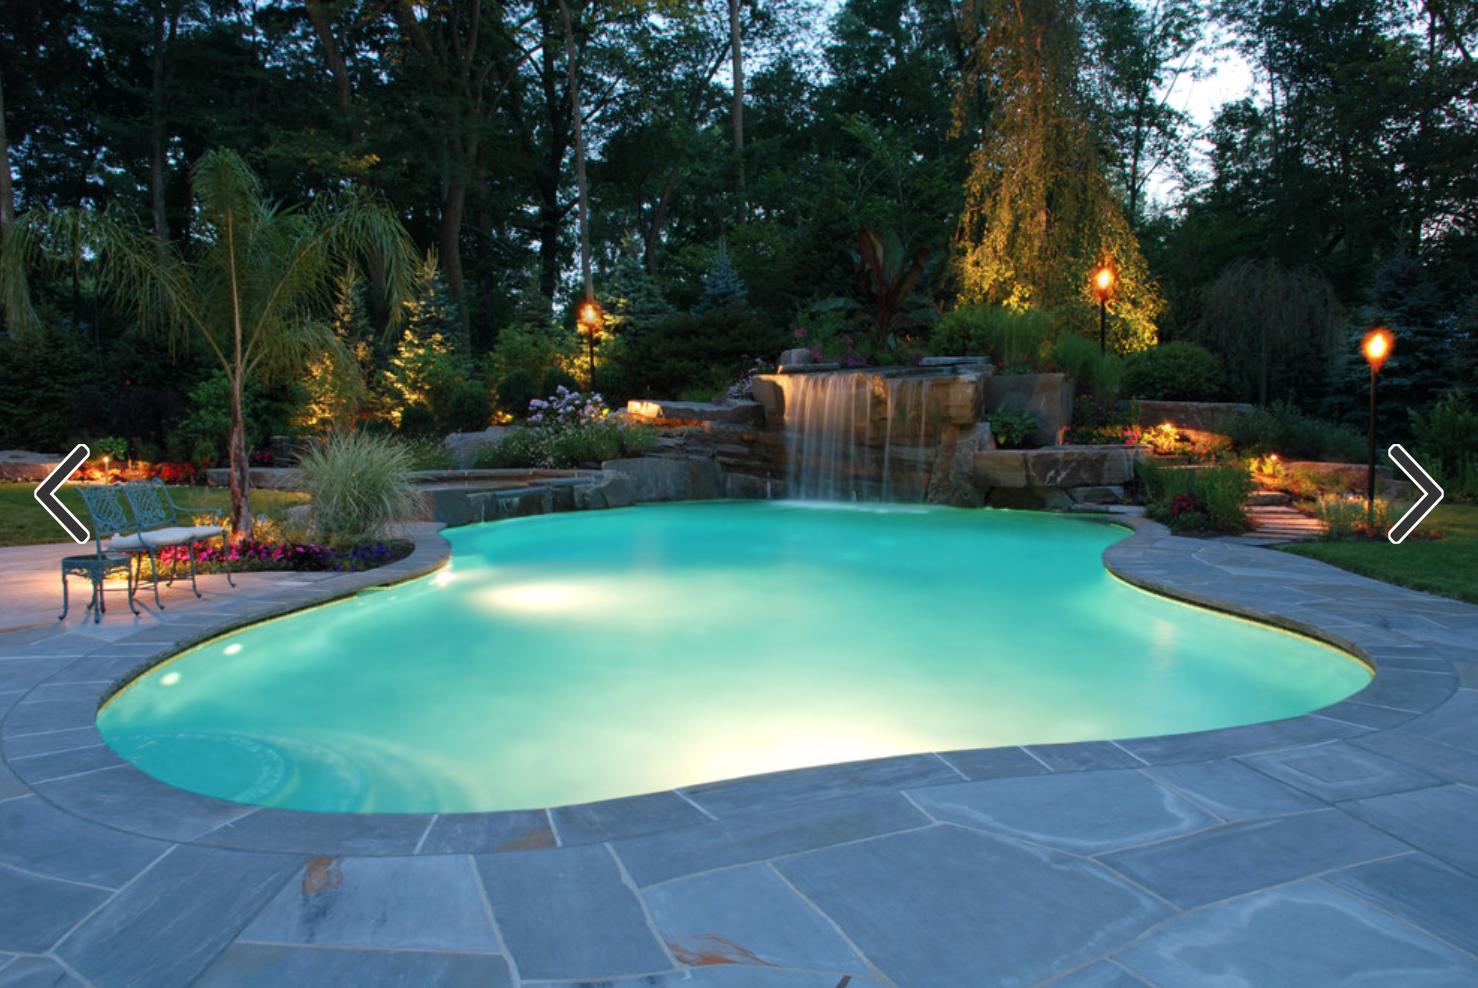 pin de john mejia en piscinas de patio trasero | pinterest